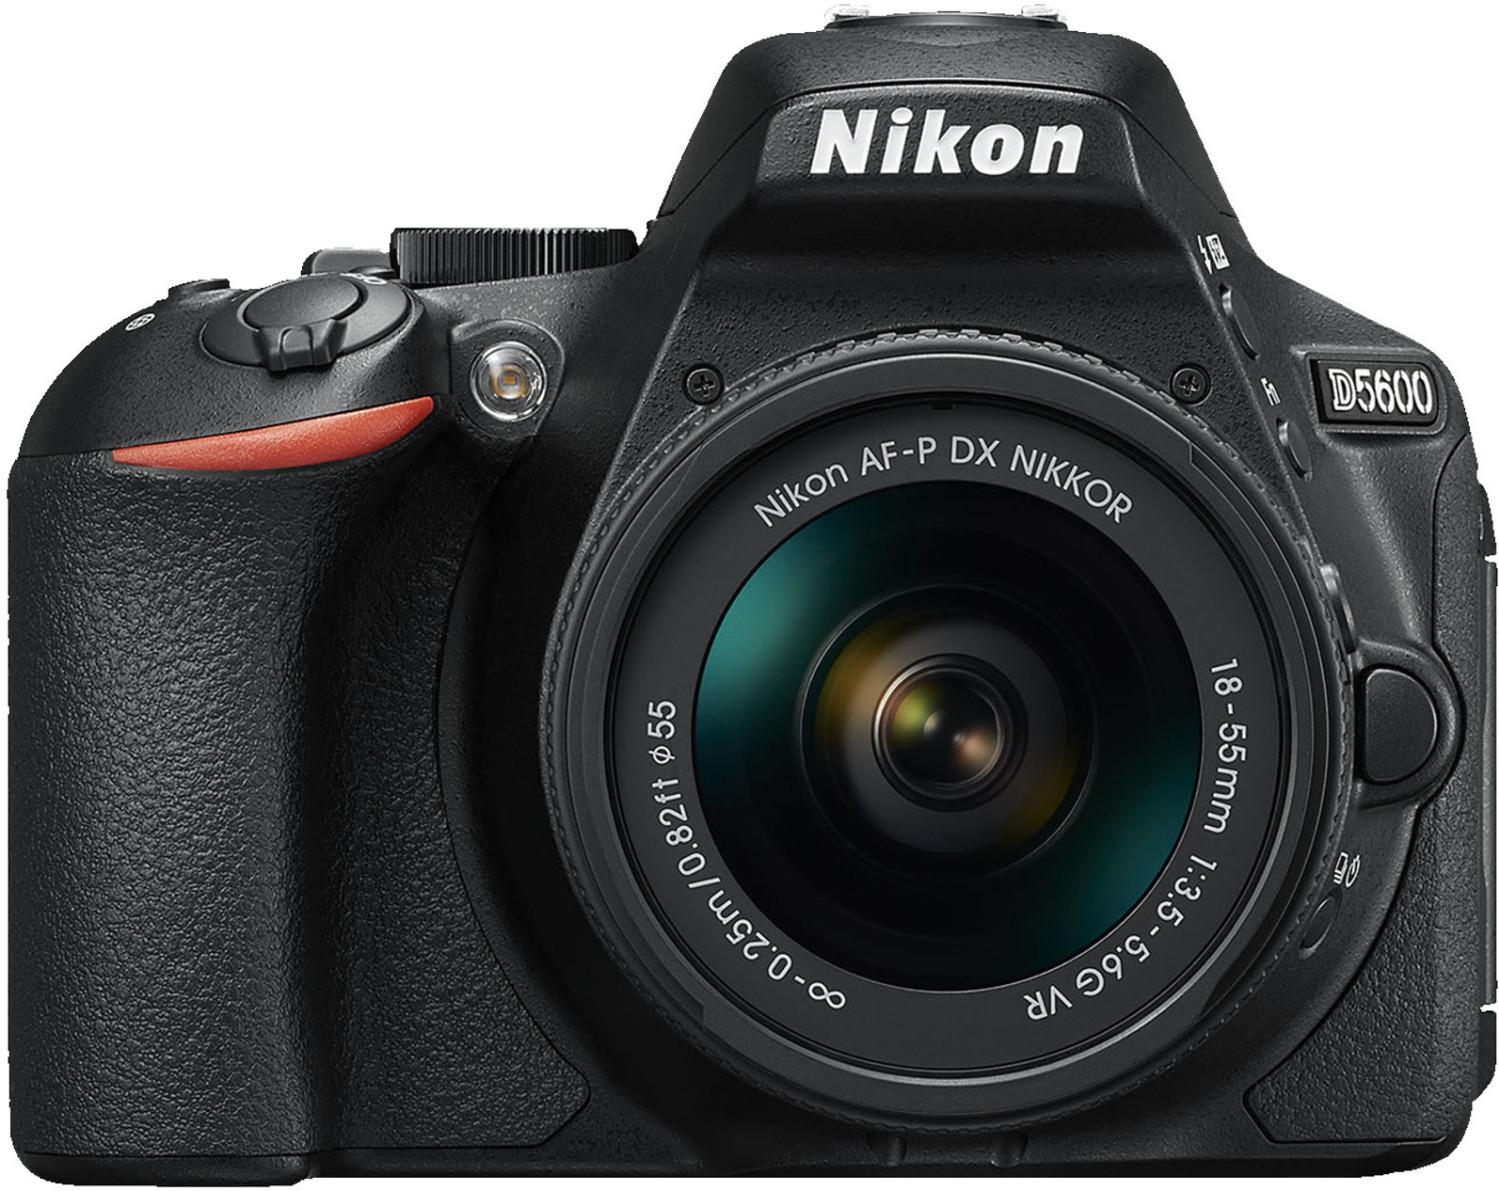 Image of Nikon D5600 Kit 18-55mm VROfferta a tempo limitato - Affrettati